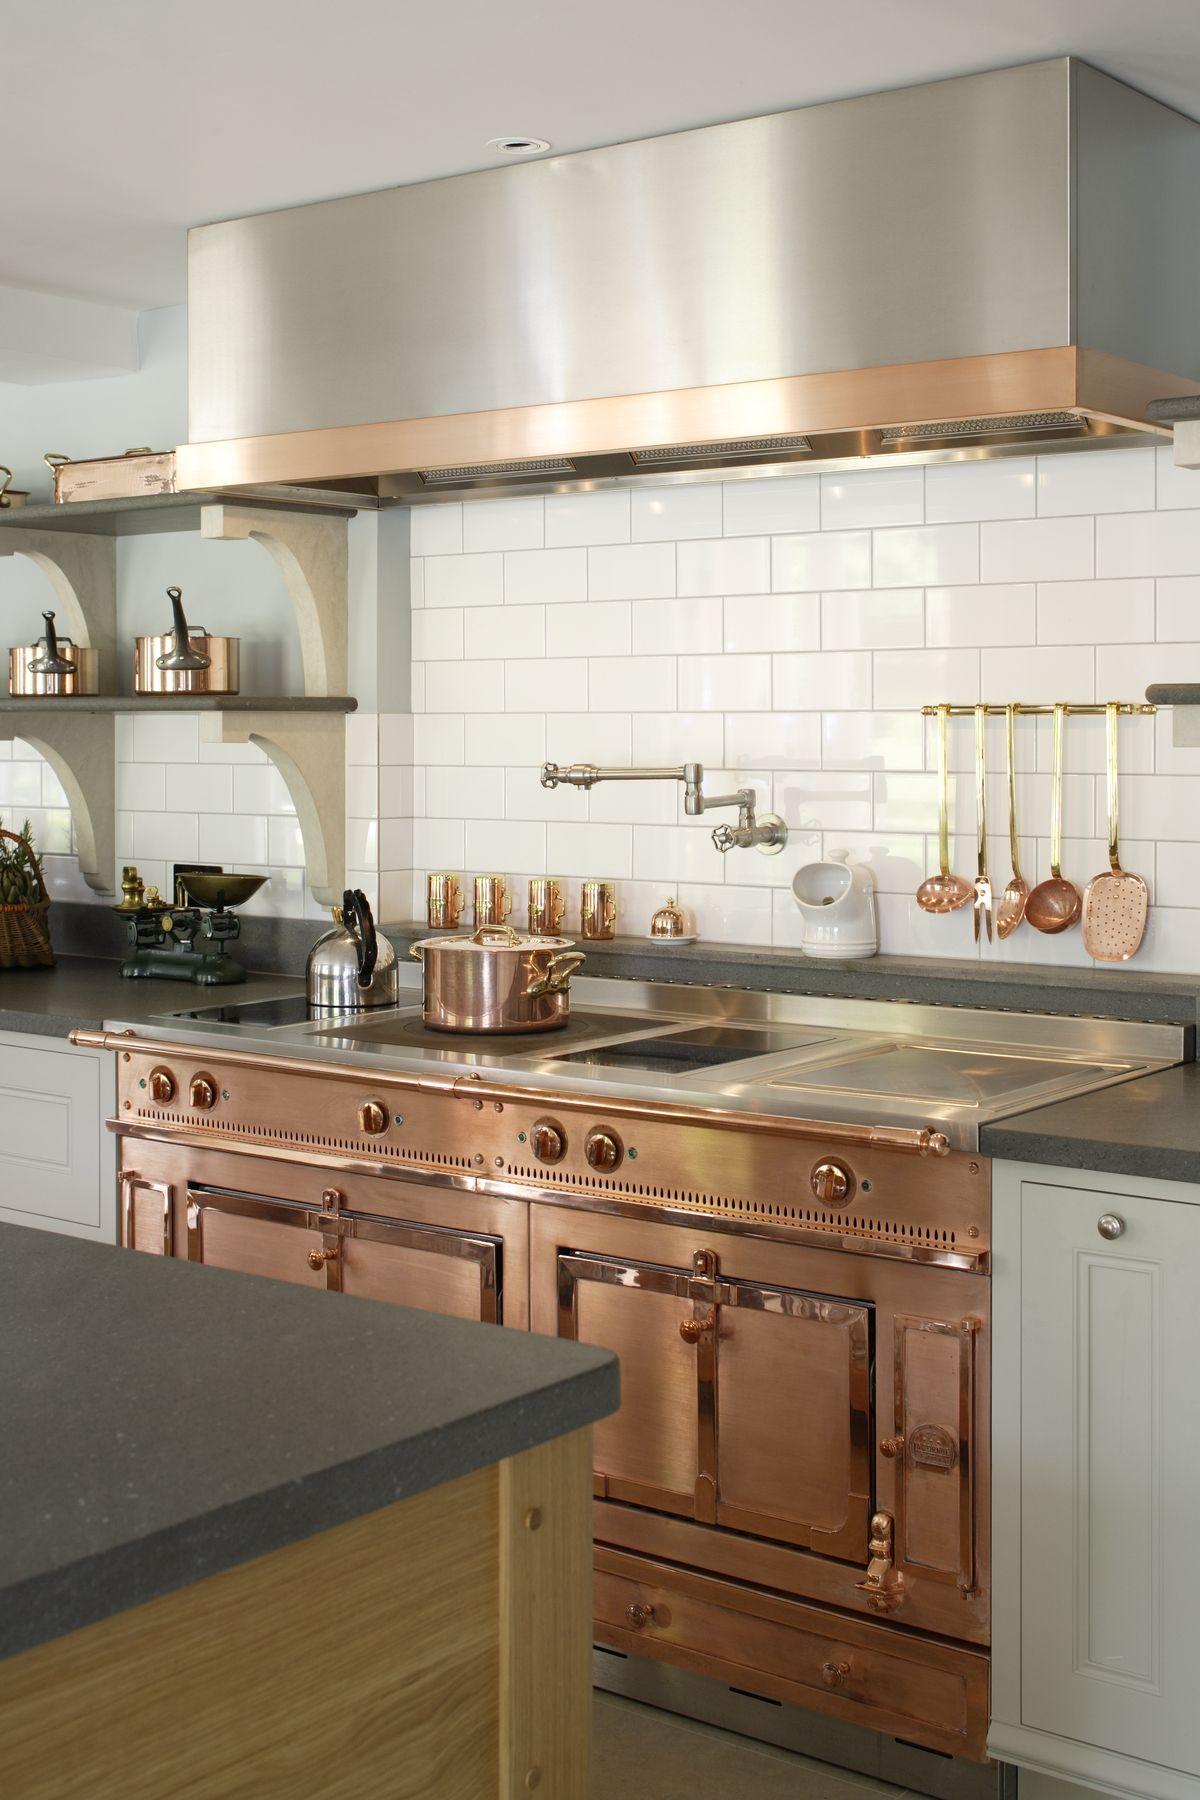 Beautiful Edwardian Style Kitchen by Artichoke | Kupfer, Küche und ...